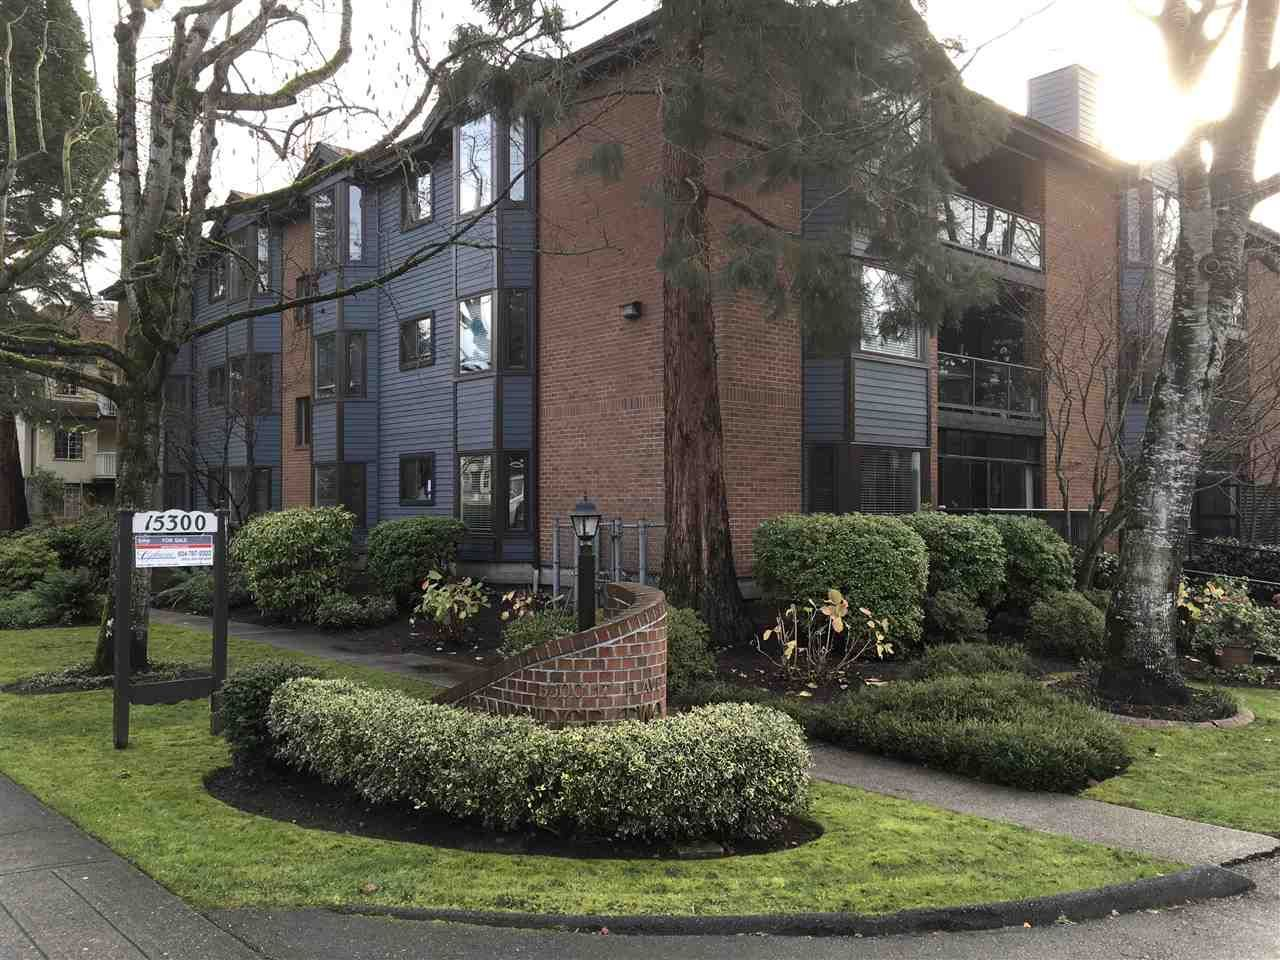 Main Photo: 105 15300 17 AVENUE in Surrey: King George Corridor Condo for sale (South Surrey White Rock)  : MLS®# R2124370